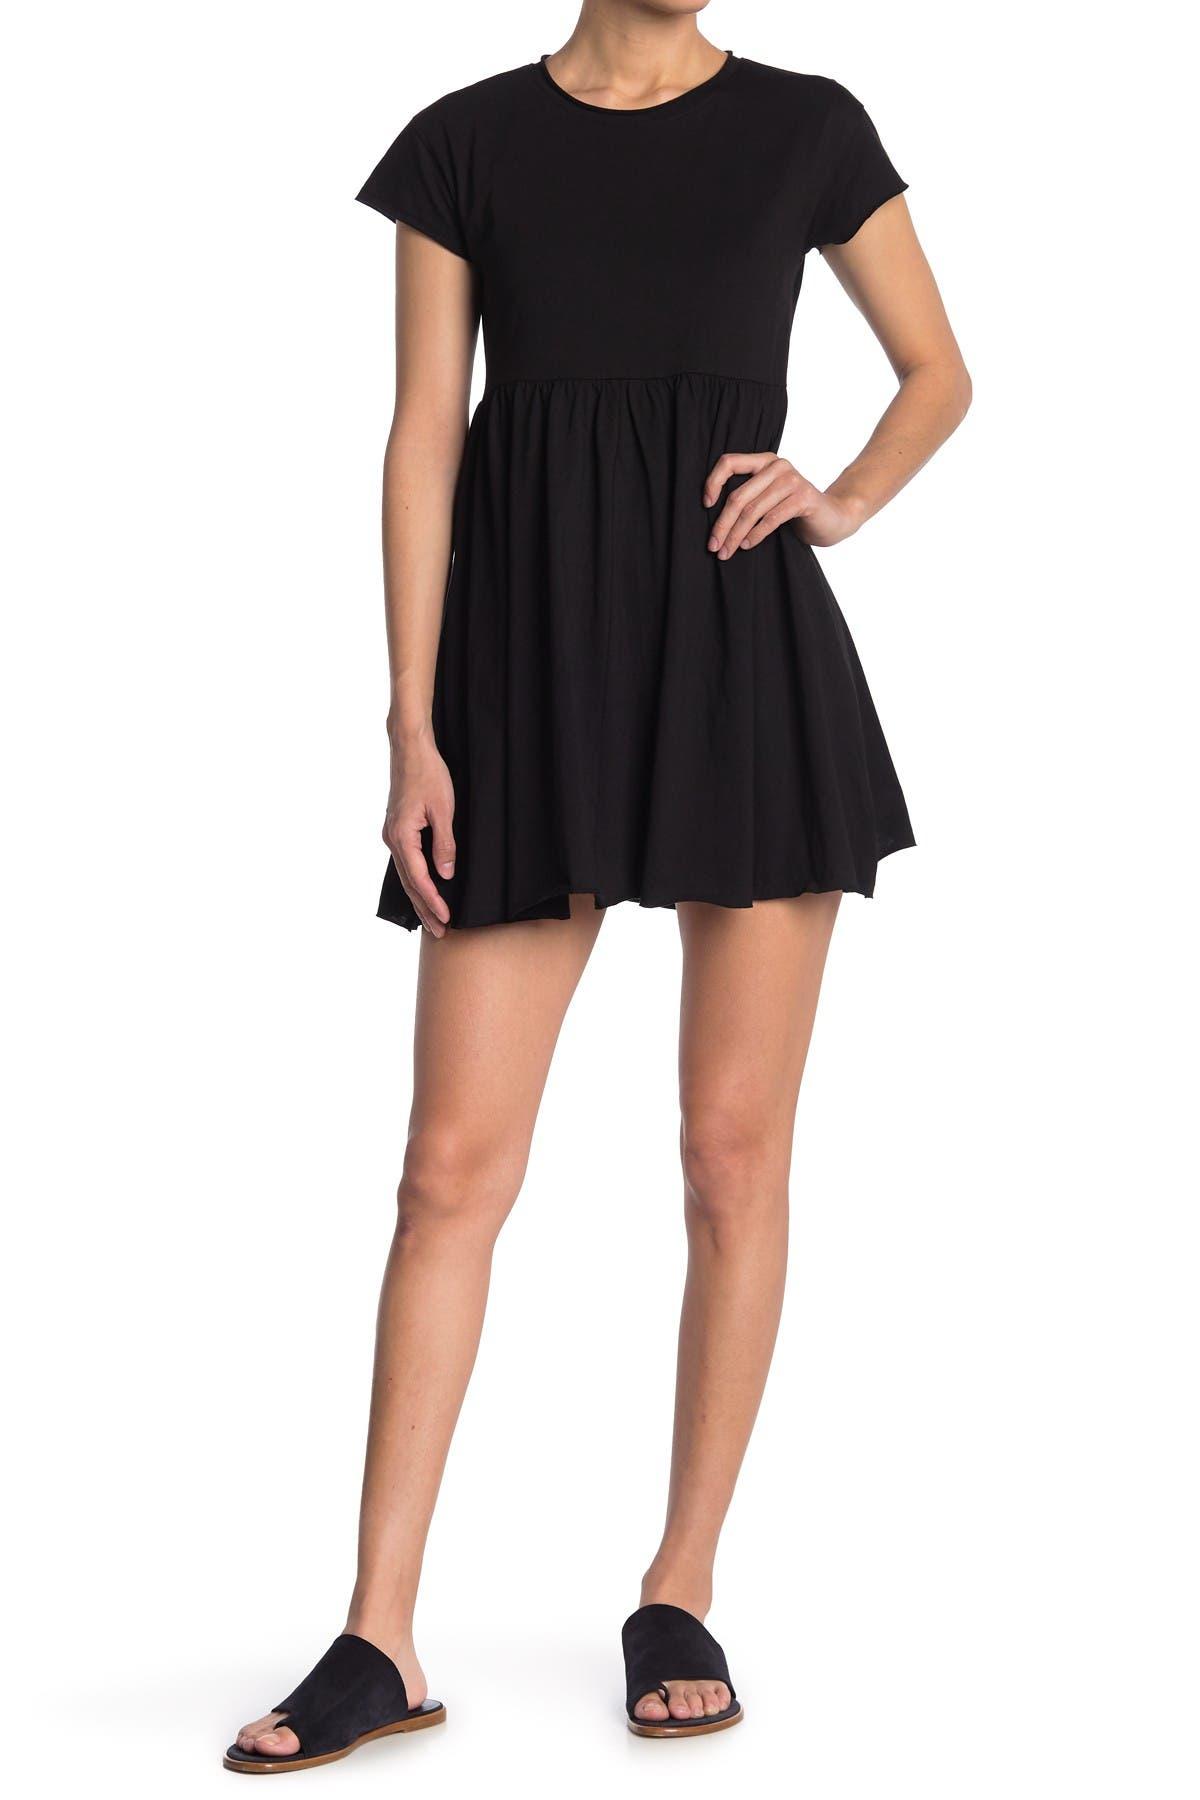 Image of Abound Short Sleeve T-Shirt Dress